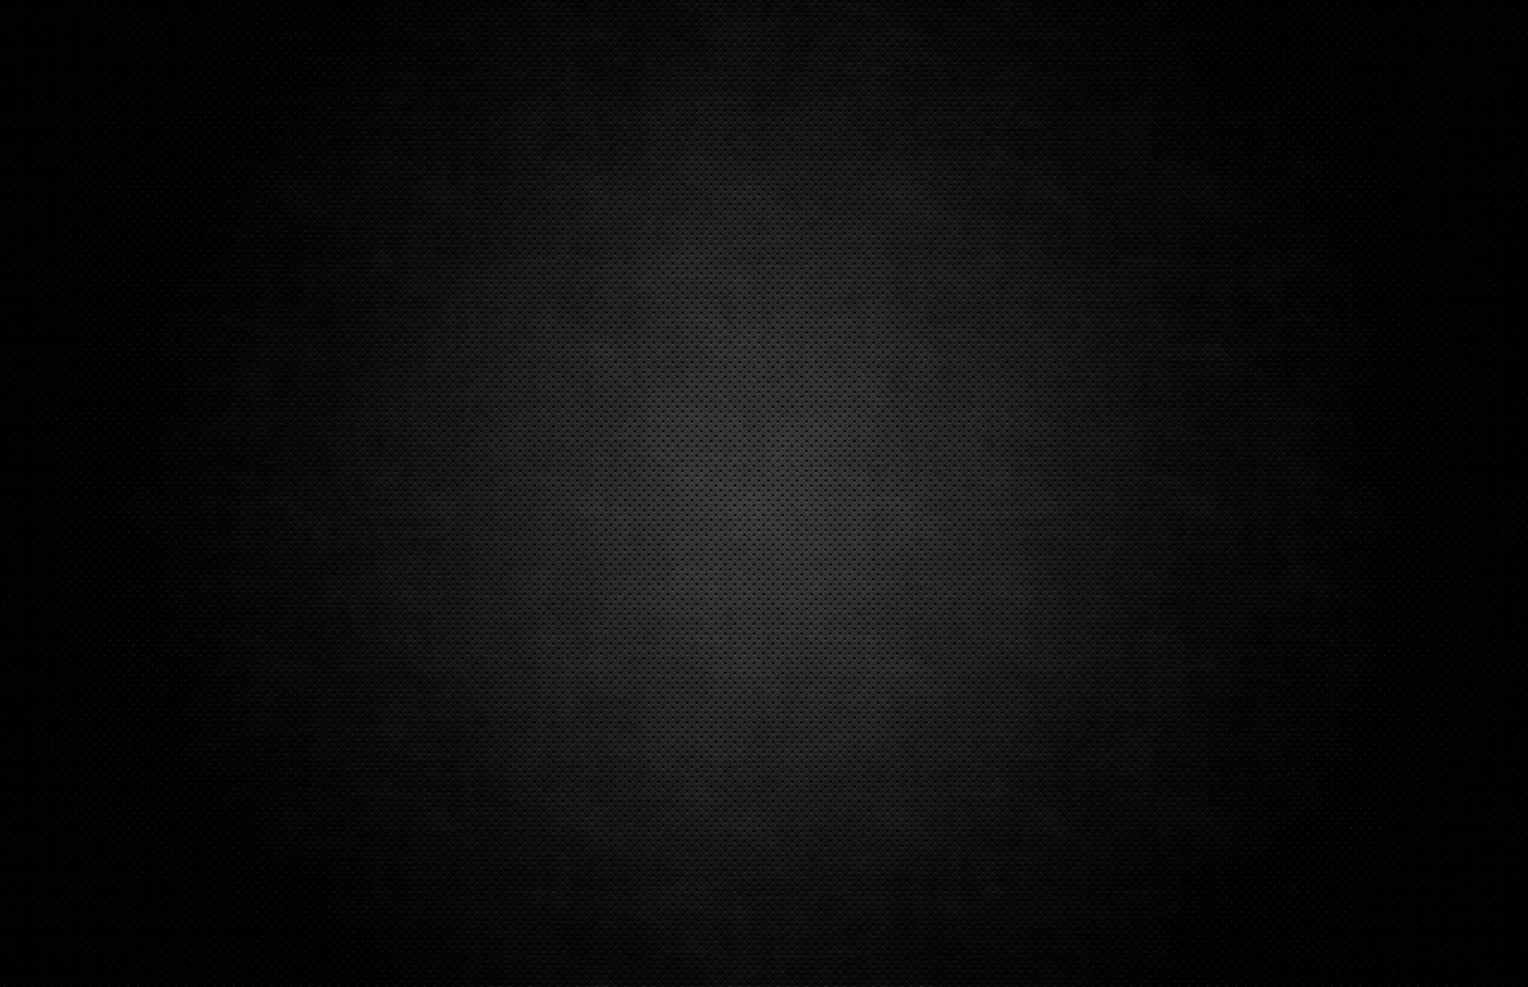 Goyard Wallpaper Iphone 6 Black Texture Wallpaper Word Wallpaper